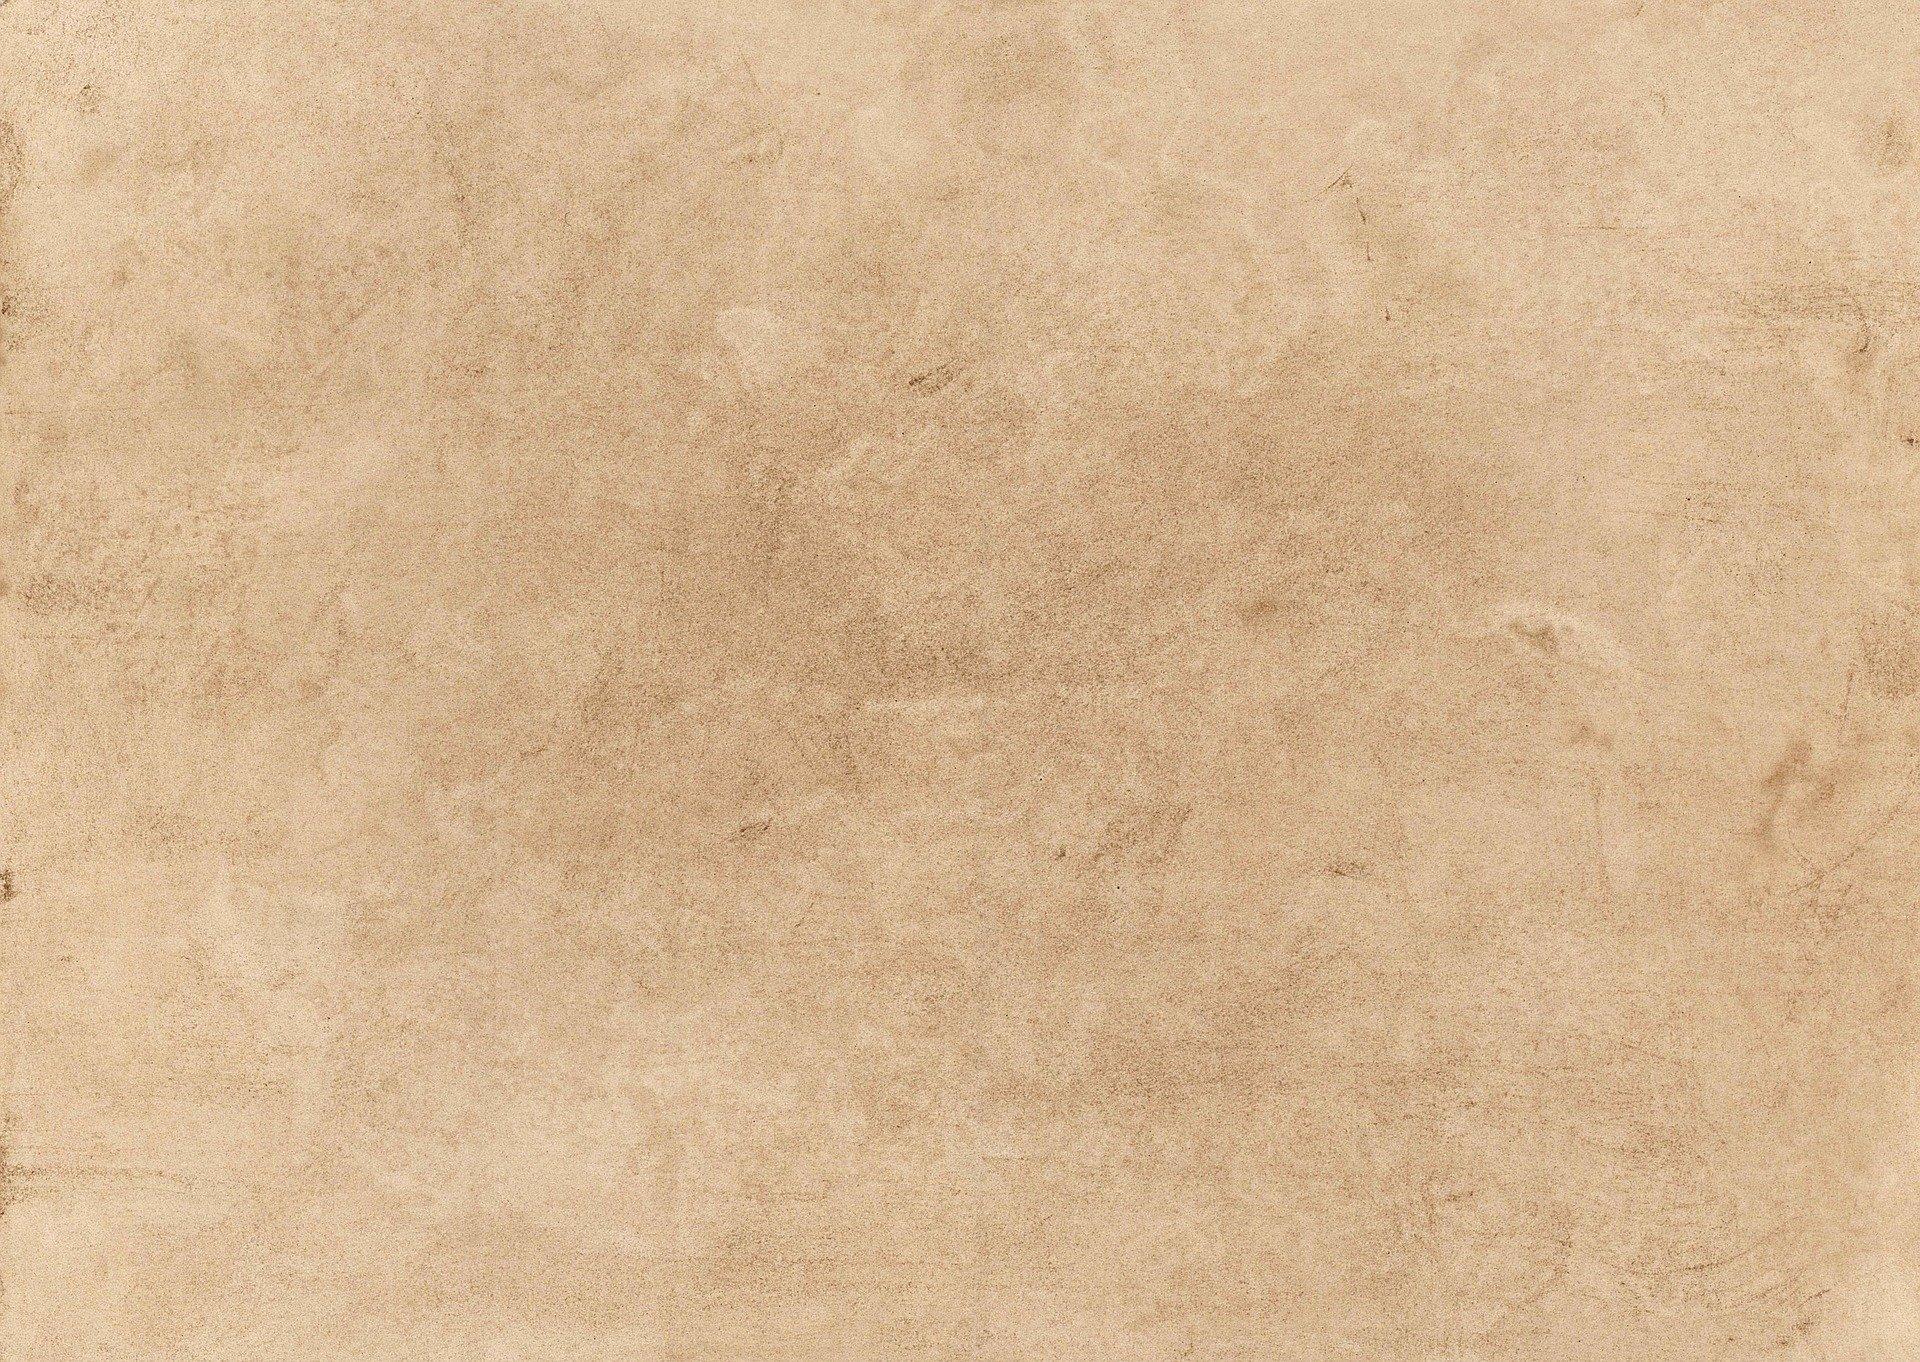 paper-1074131_1920